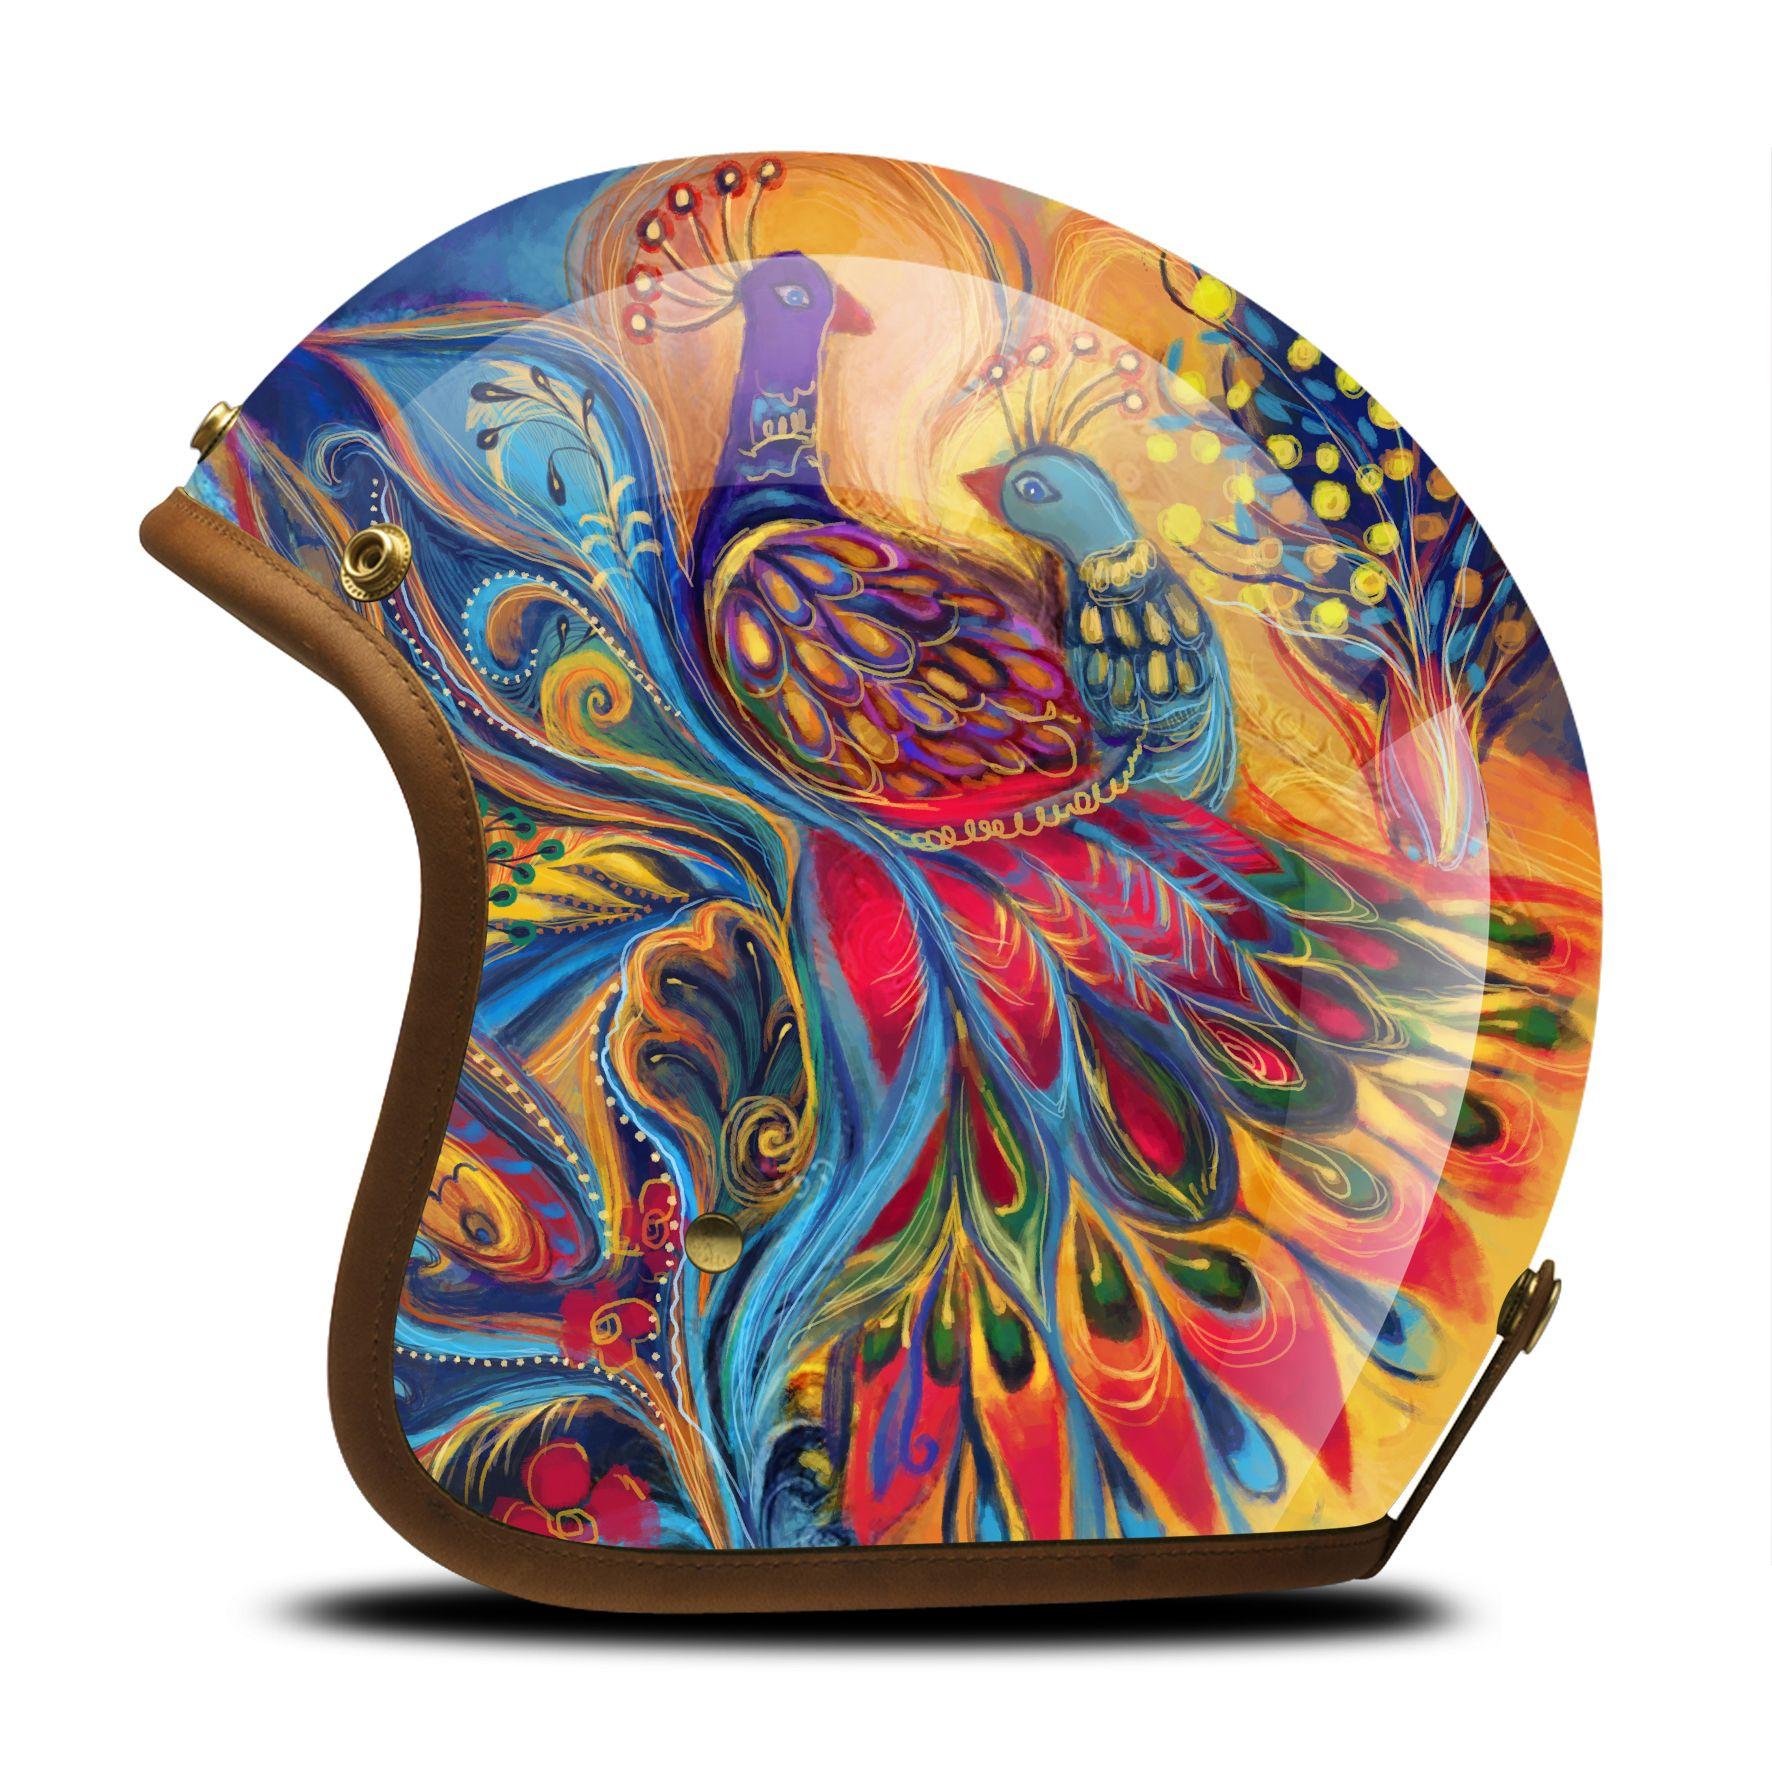 Cafe Racer Helmet Custom Helmets Motorcycle Shell Art Paint Biker Motorcycles Skull Cap